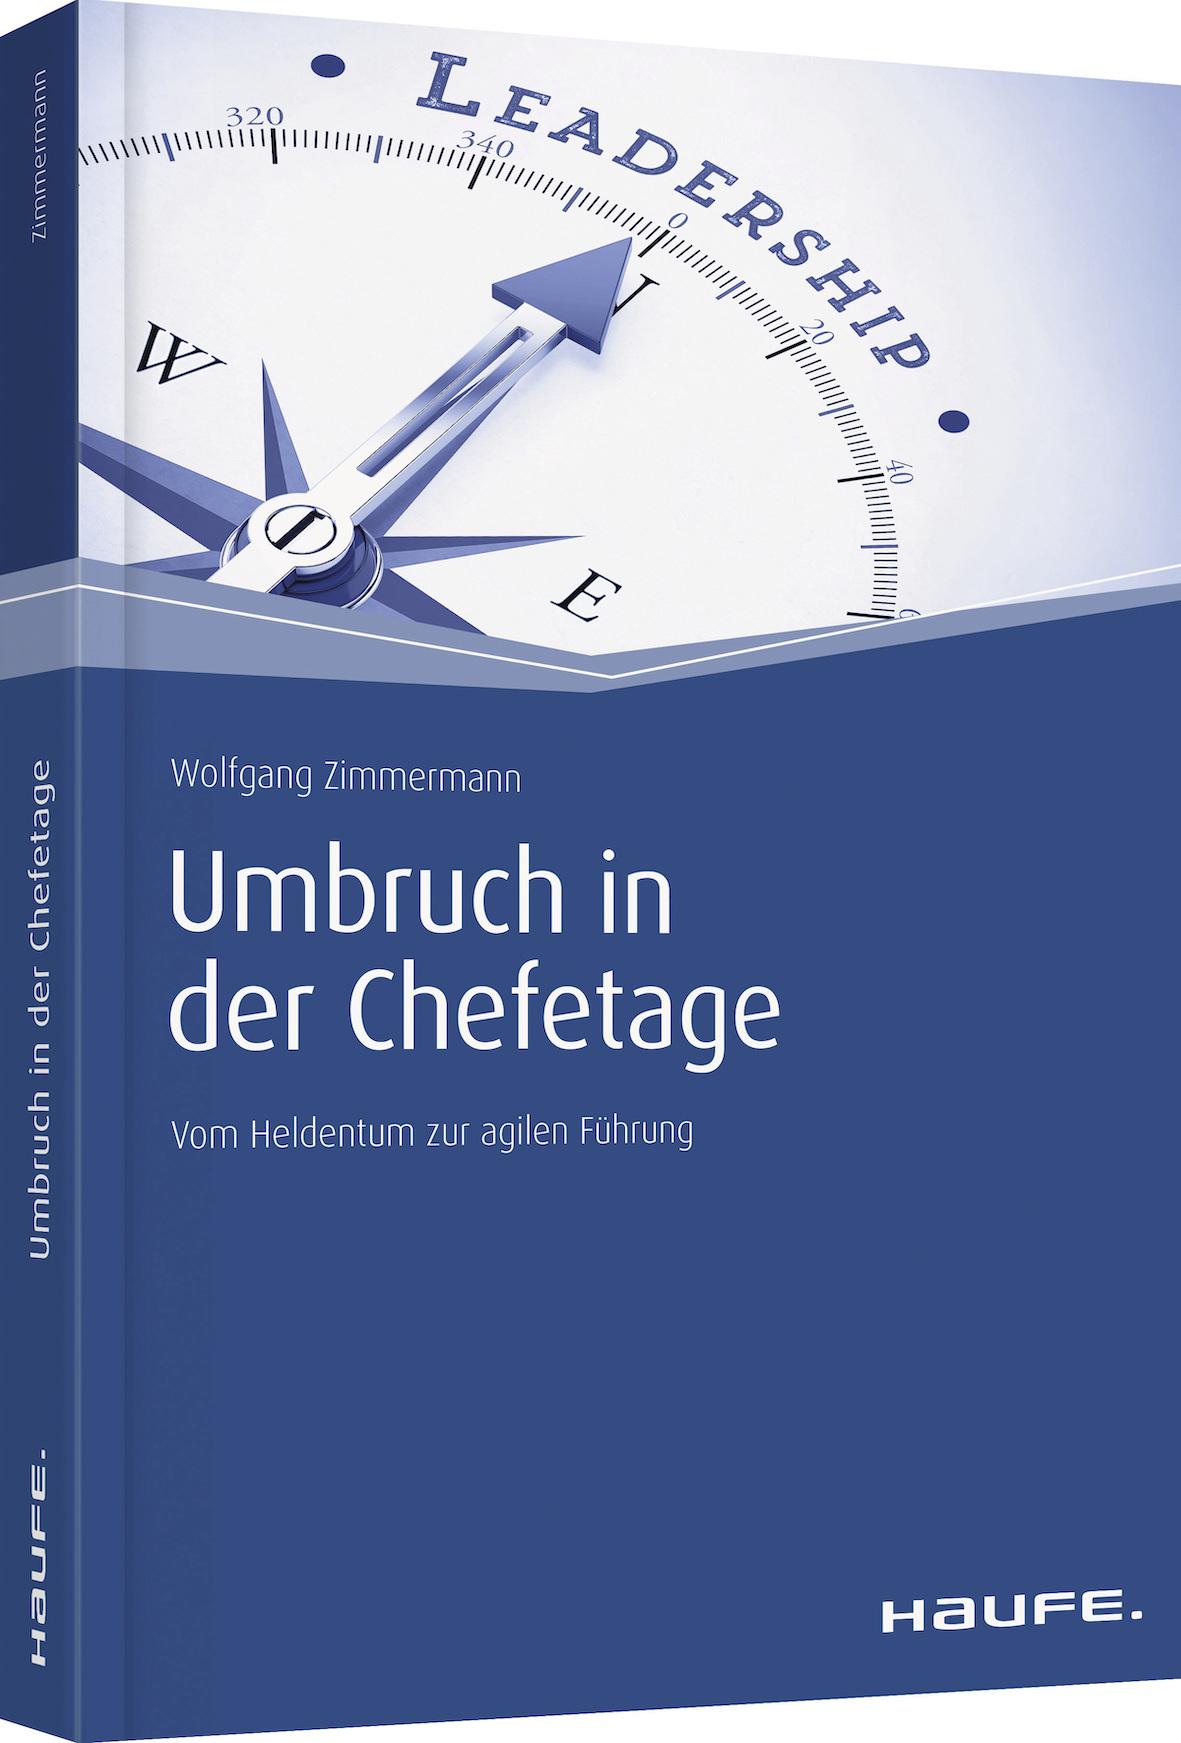 Expert Marketplace -  Wolfgang Zimmermann - Umbruch in der Chefetage